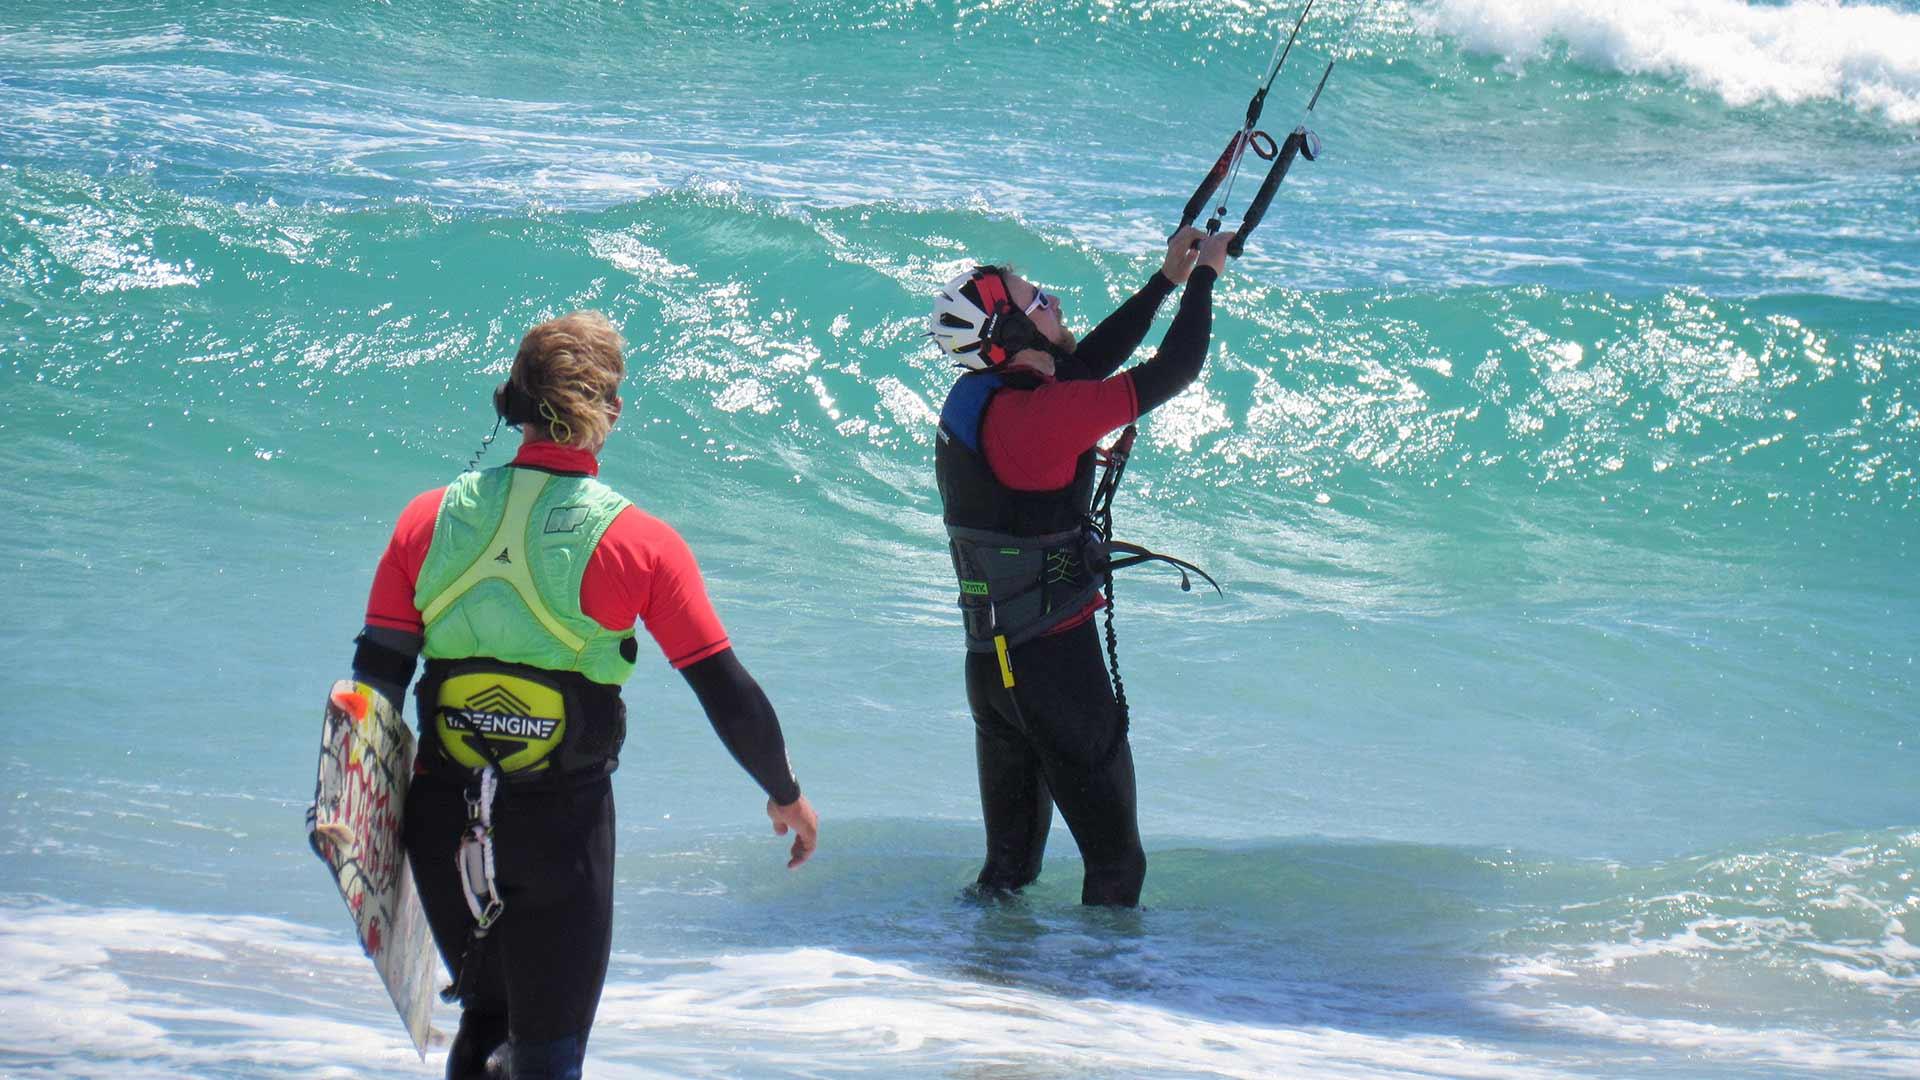 kitesurfing course beginners